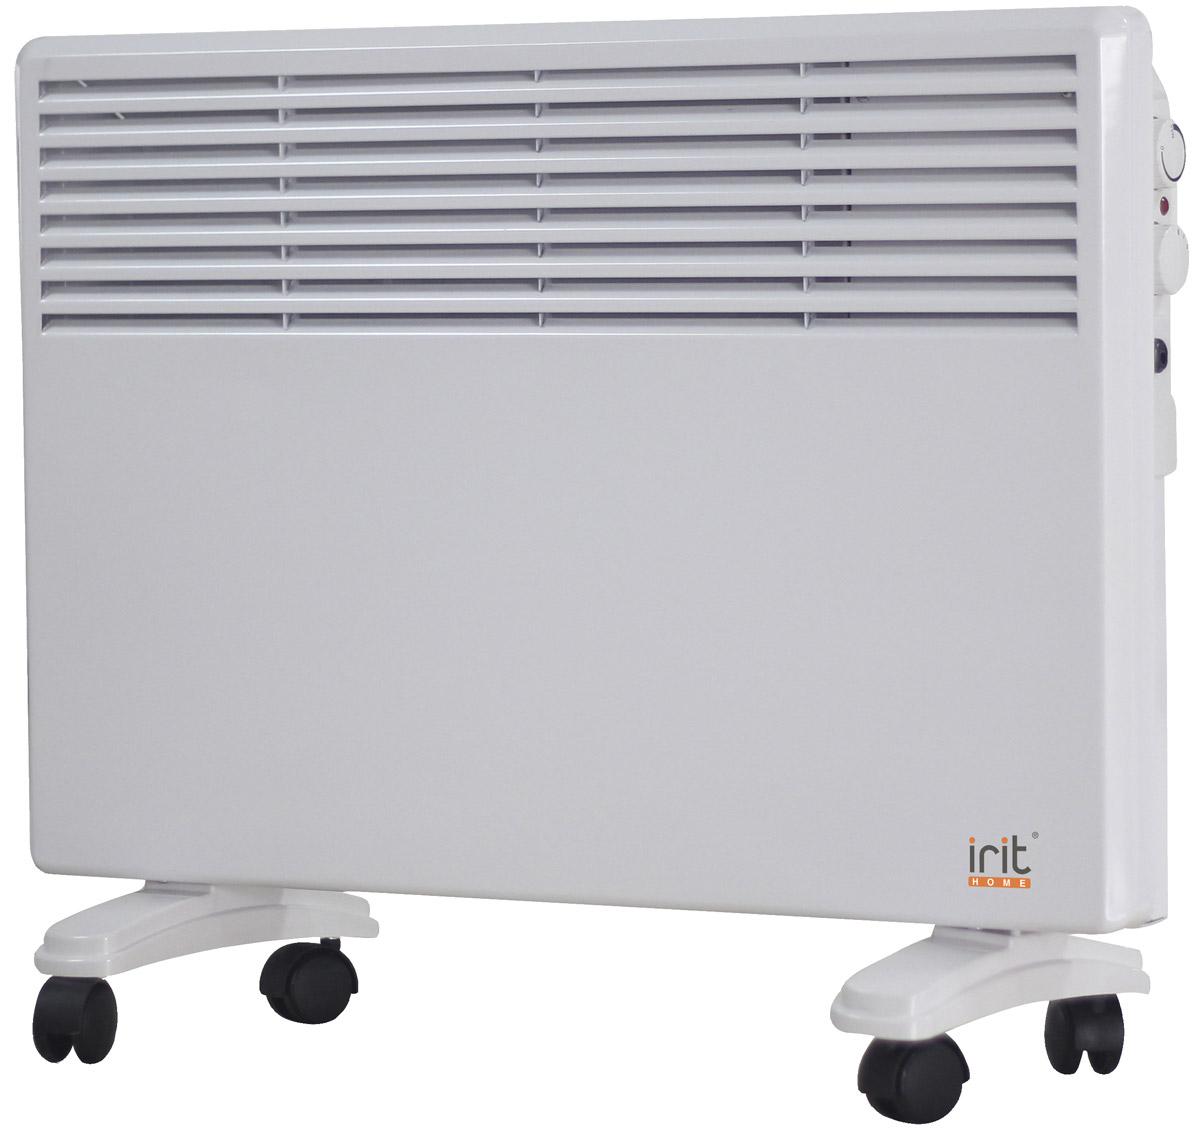 irit IR-6205 конвекторный обогреватель обогреватель irit ir 6025